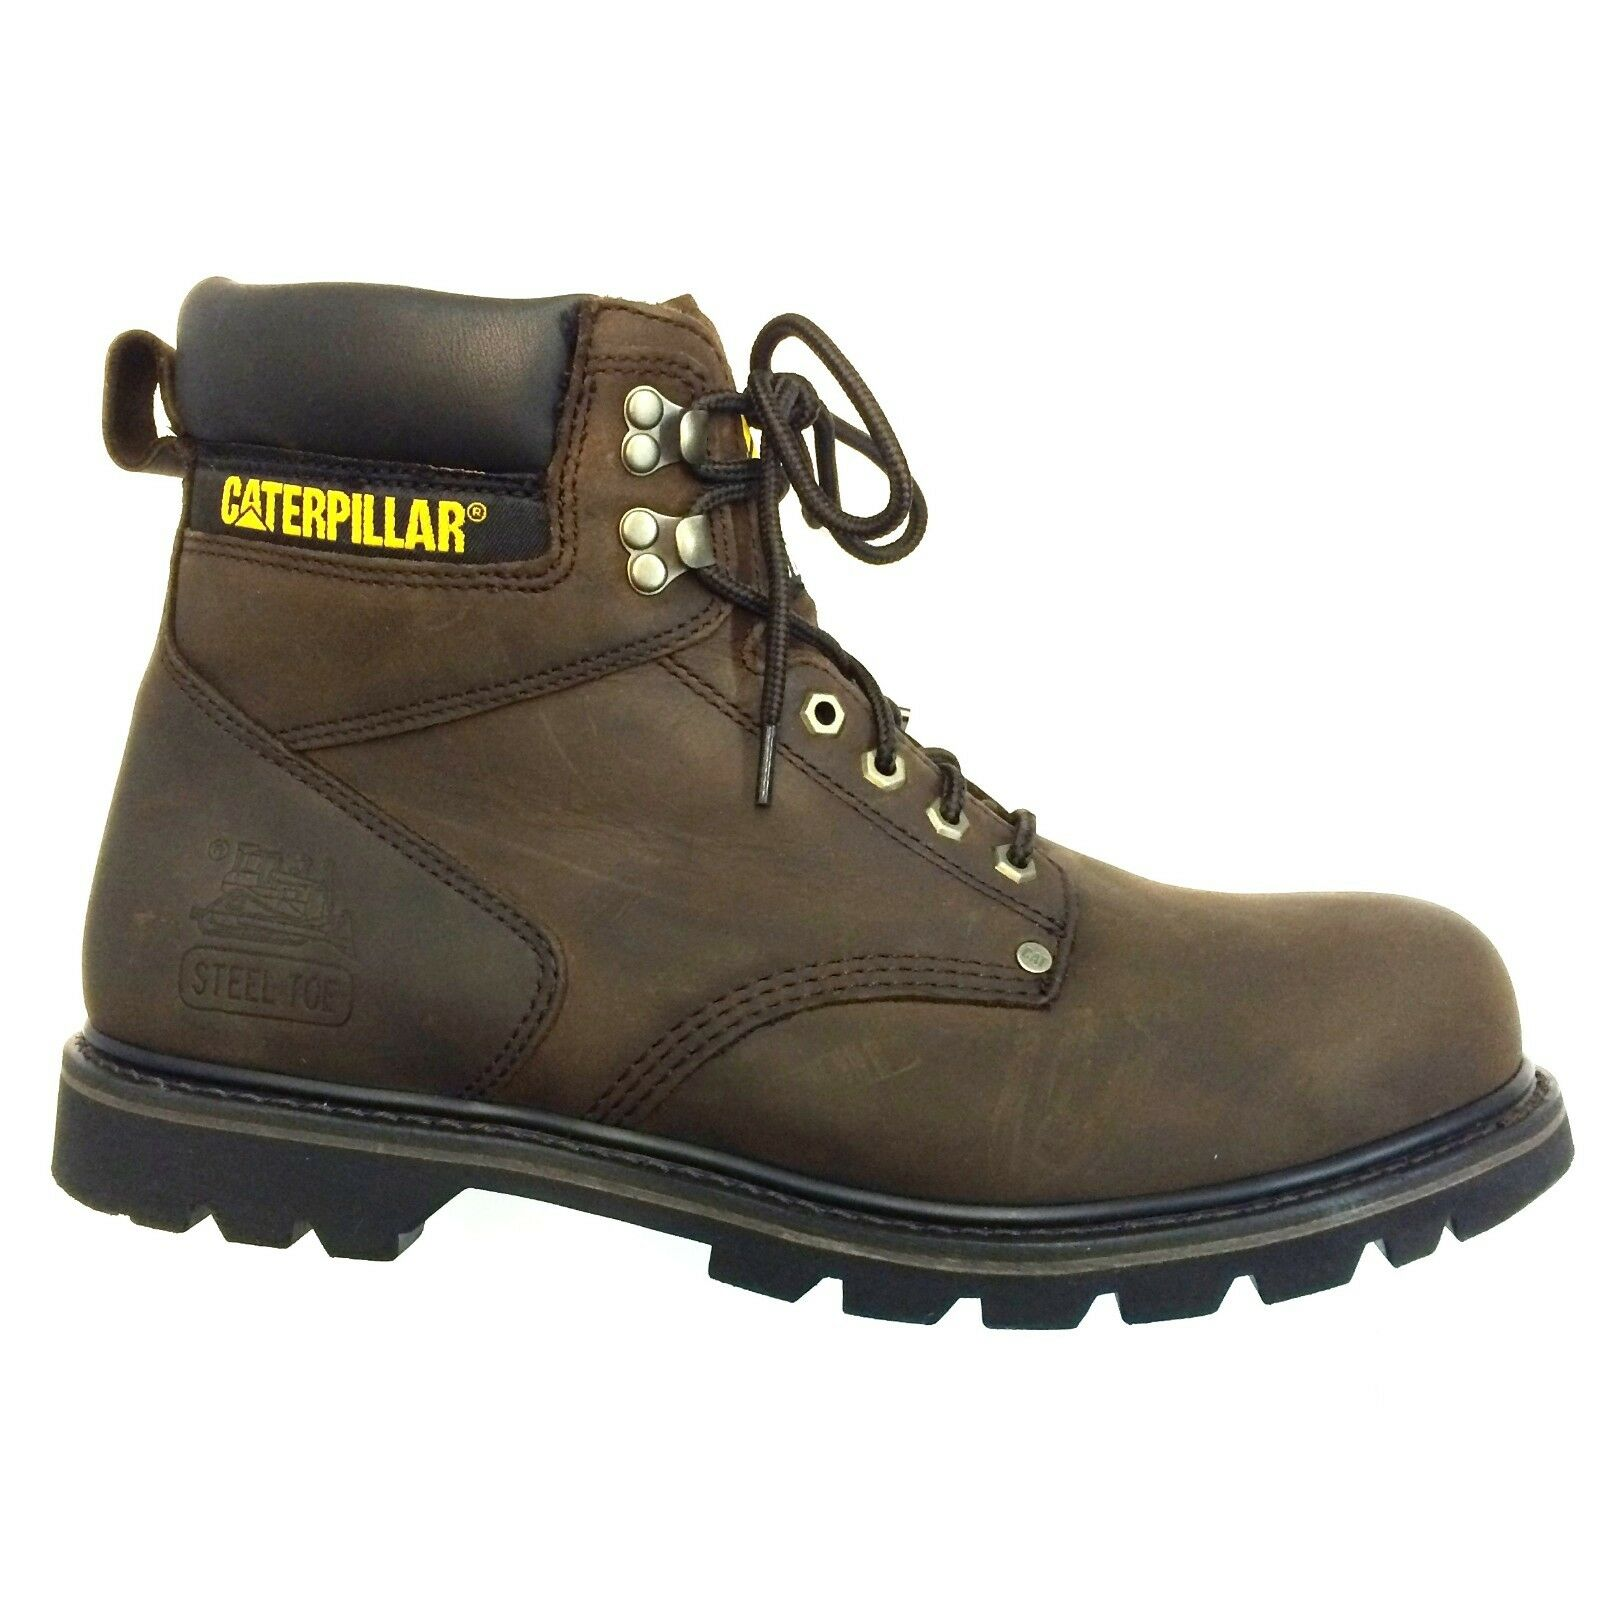 Men's Caterpillar, SECOND SHIFT, Steel Toe, Work Boot Brown, P89586